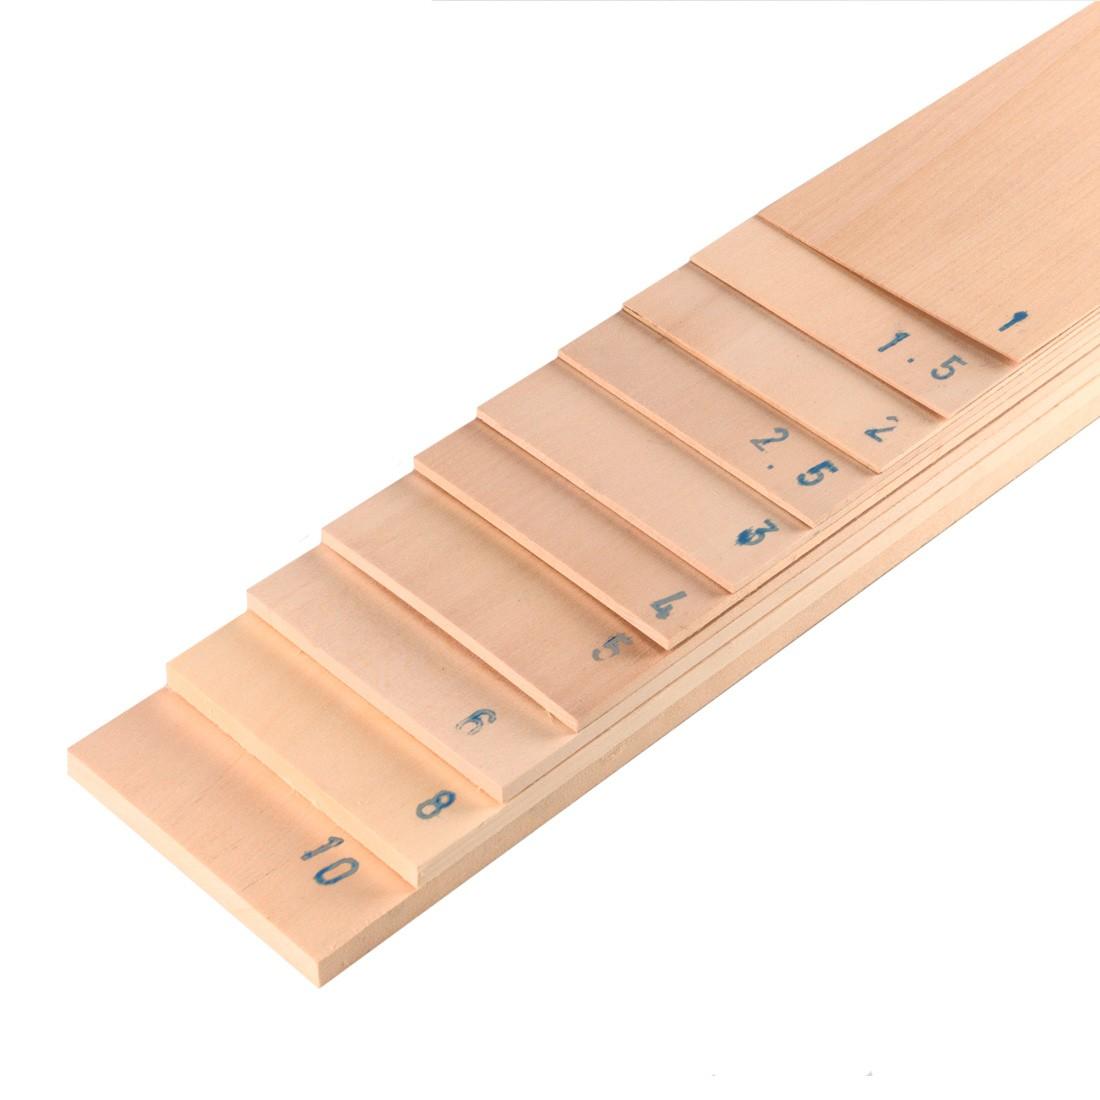 Limewood tablet mm.3x100x1000